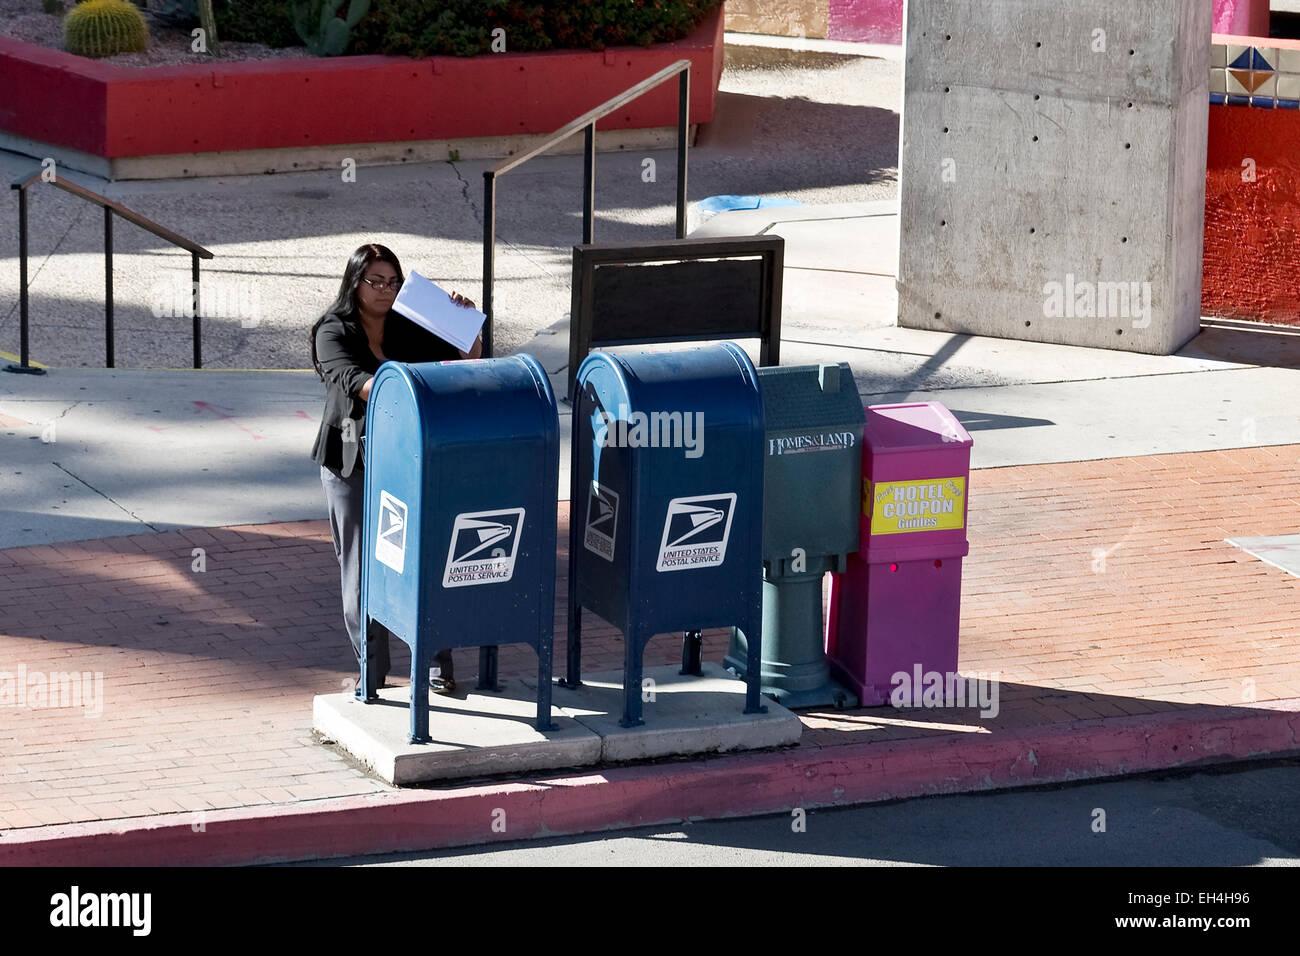 Woman mailing documents via public USPS mailbox - Stock Image